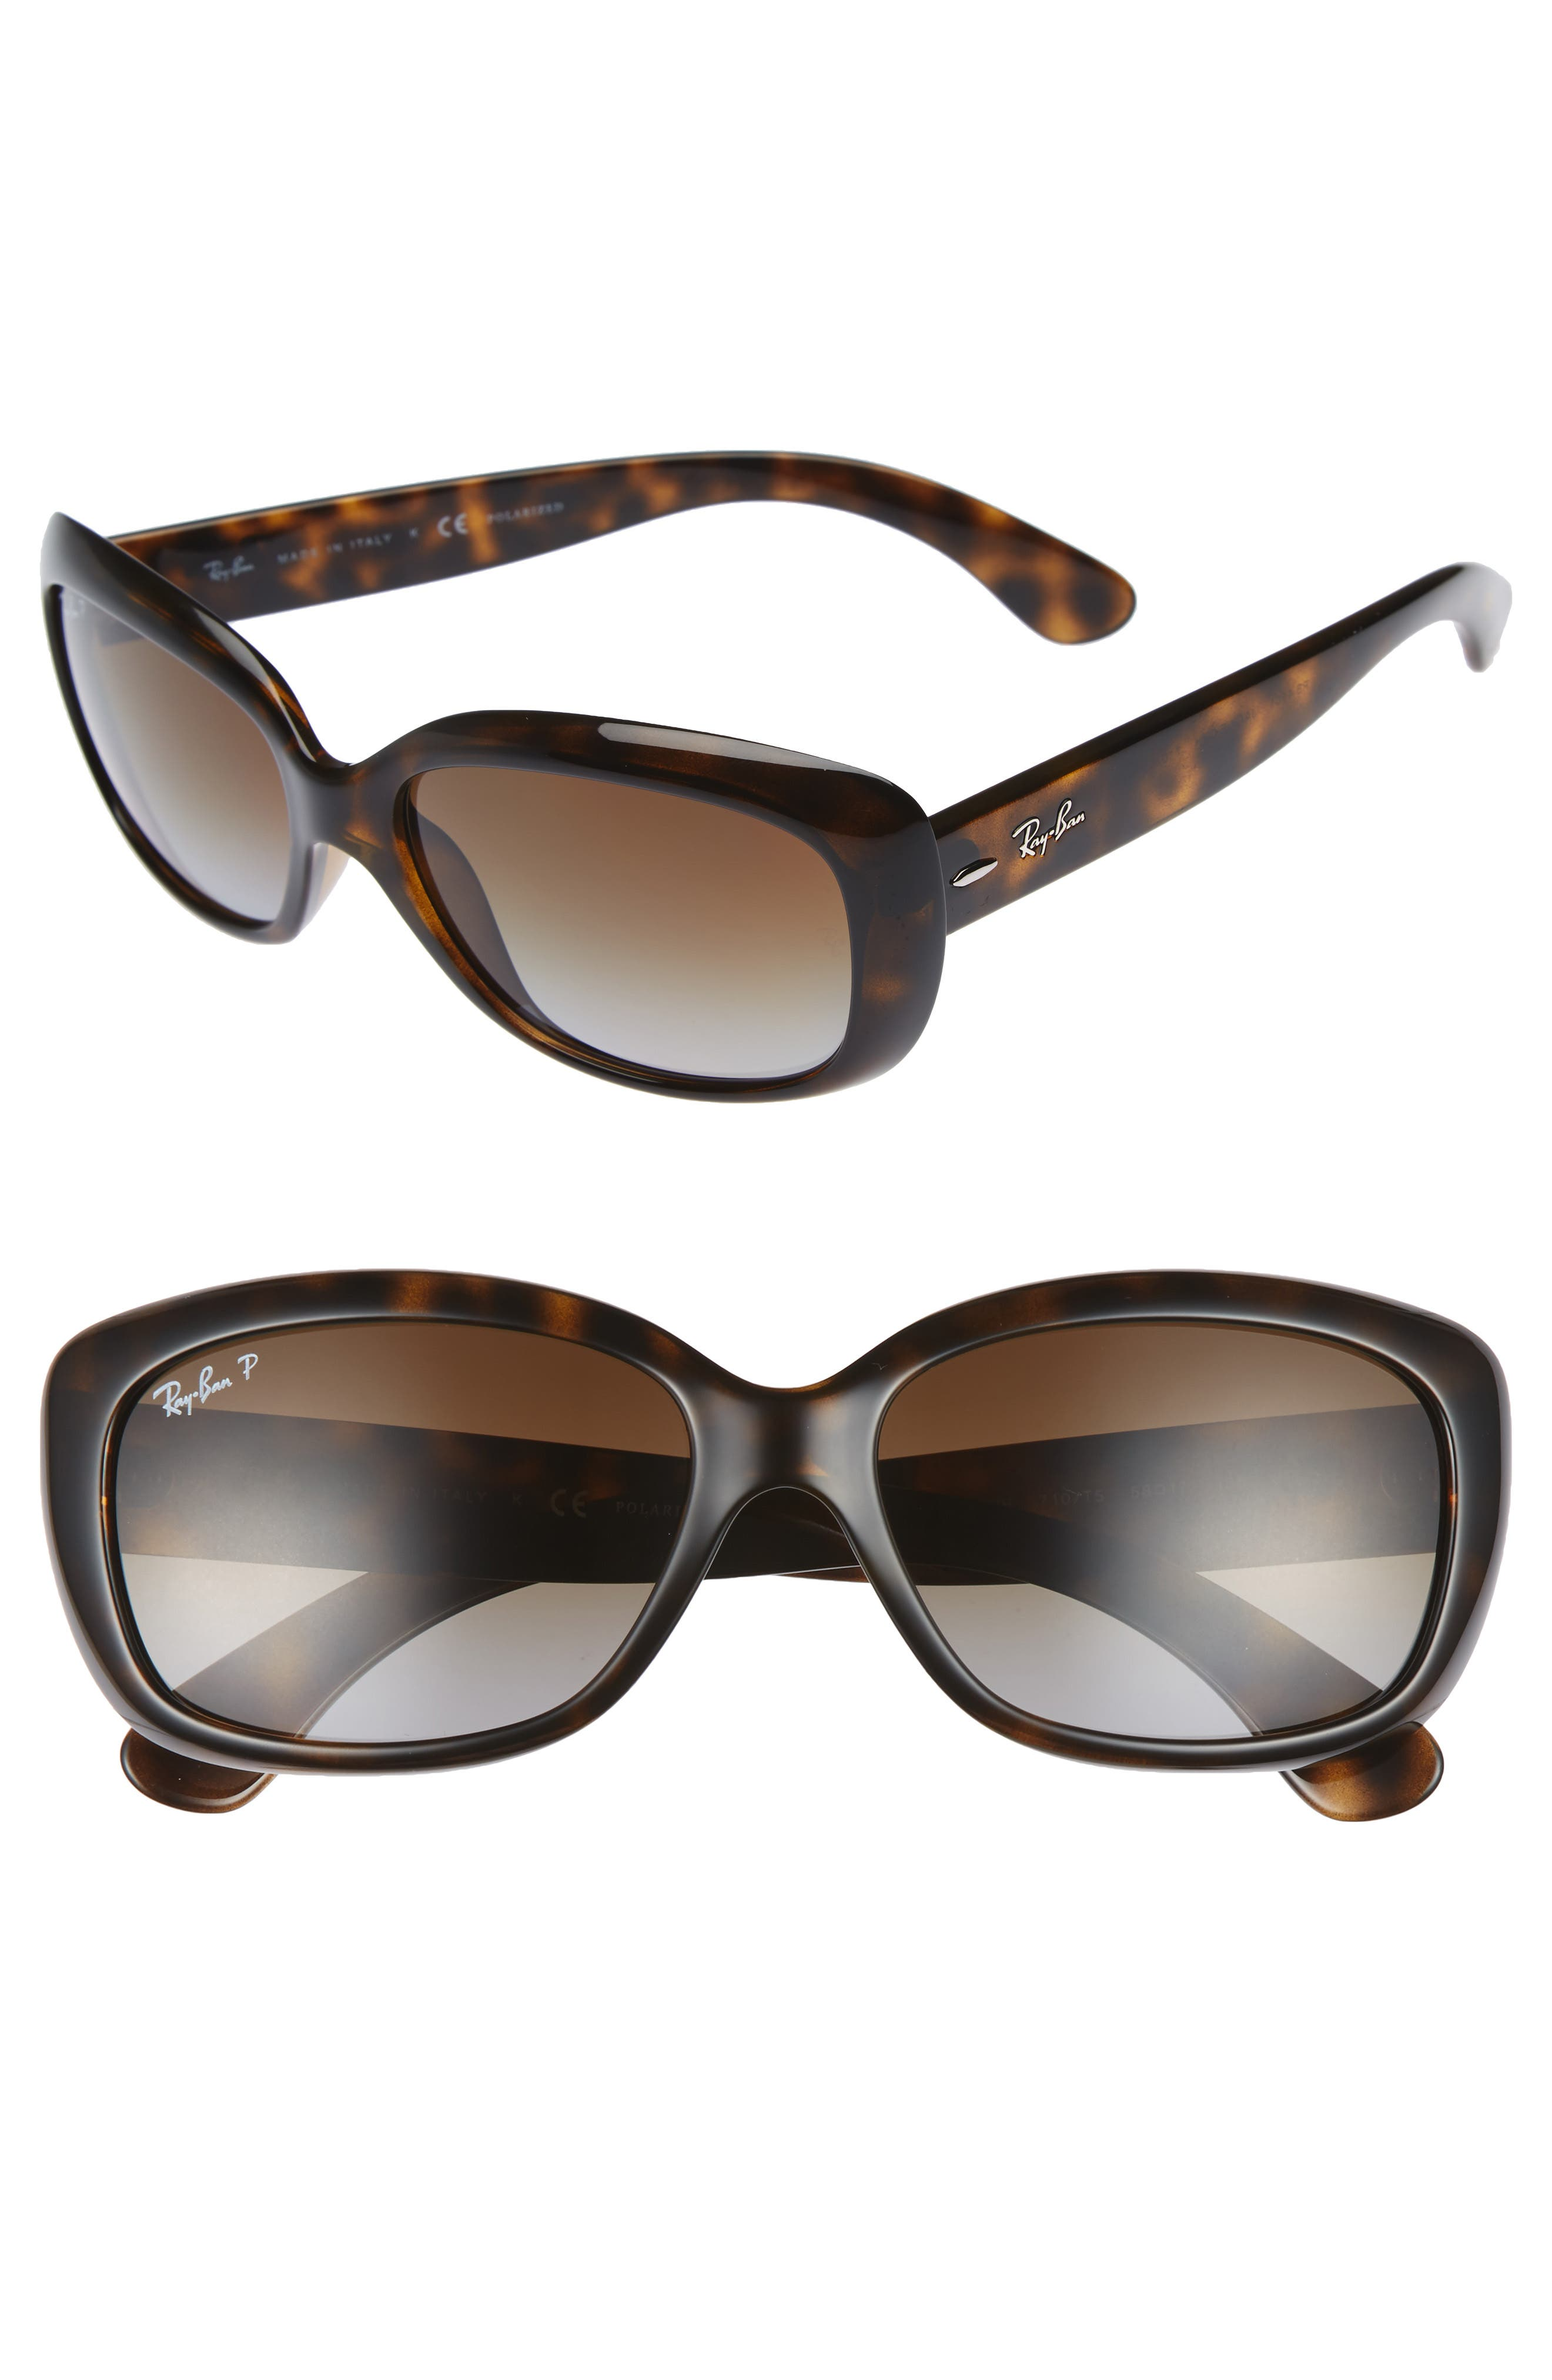 Main Image - Ray-Ban 58mm Polarized Sunglasses